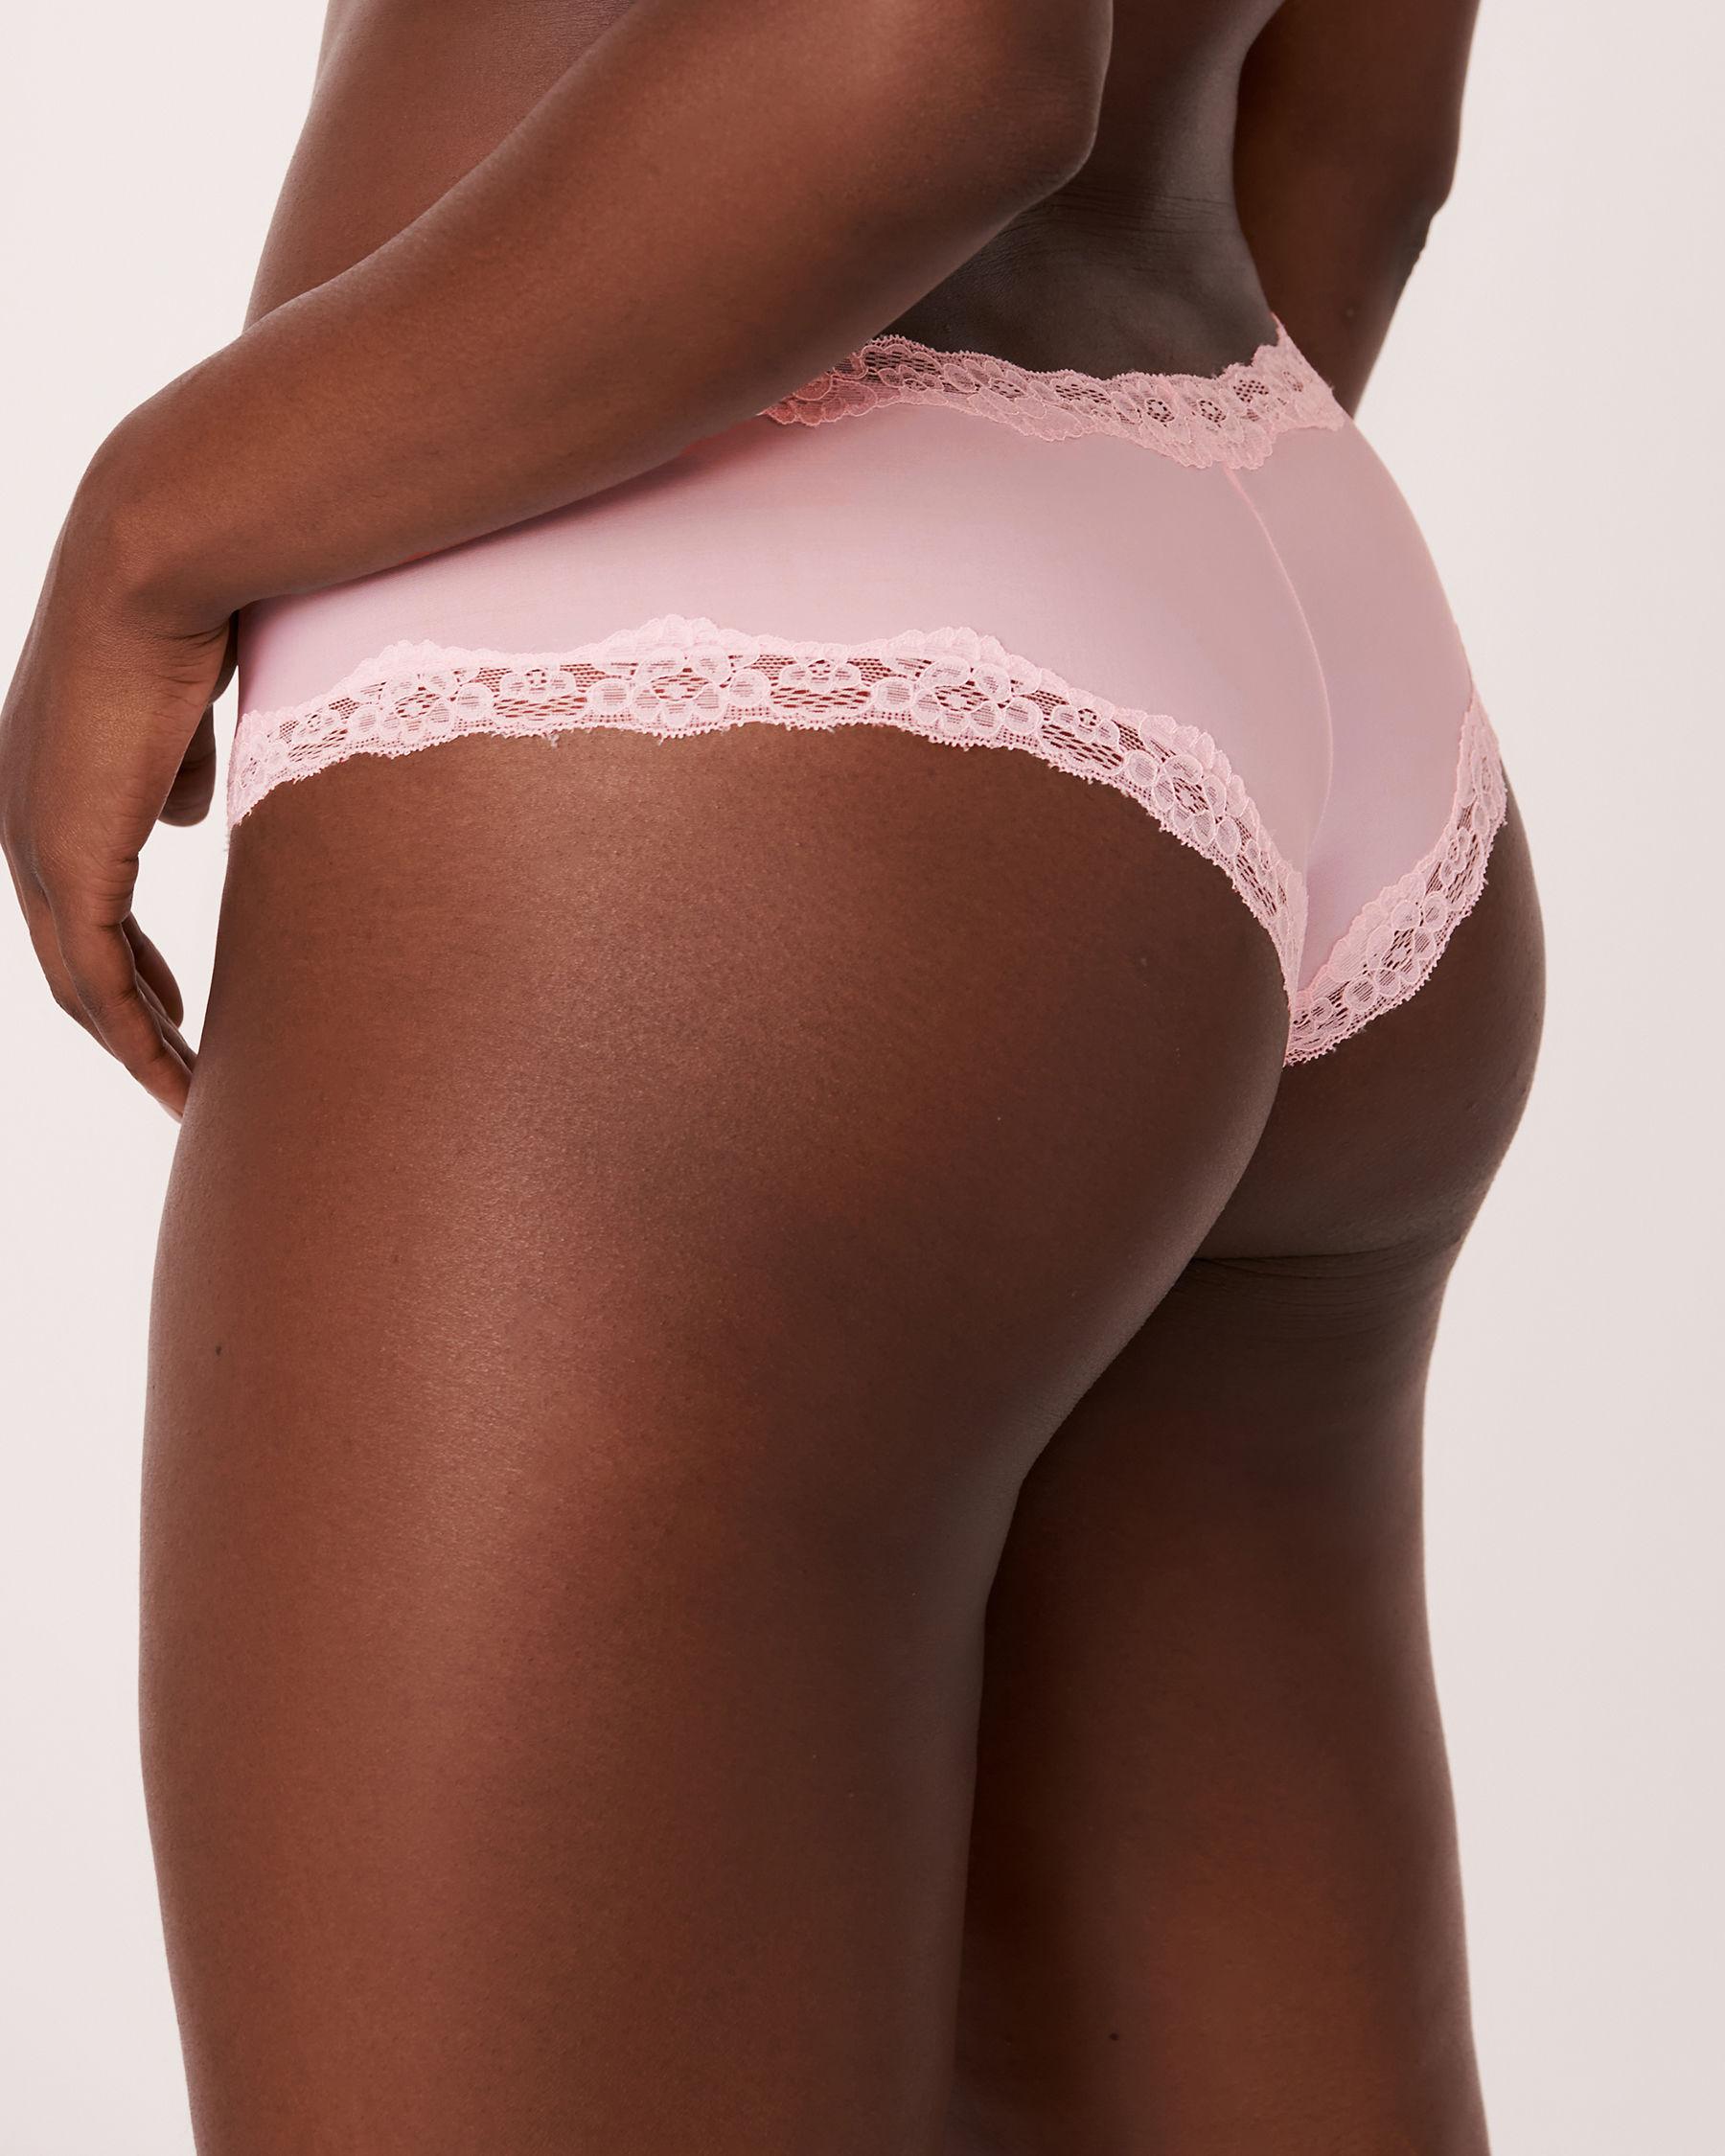 LA VIE EN ROSE Culotte cheeky Rose 018-225-0-00 - Voir2